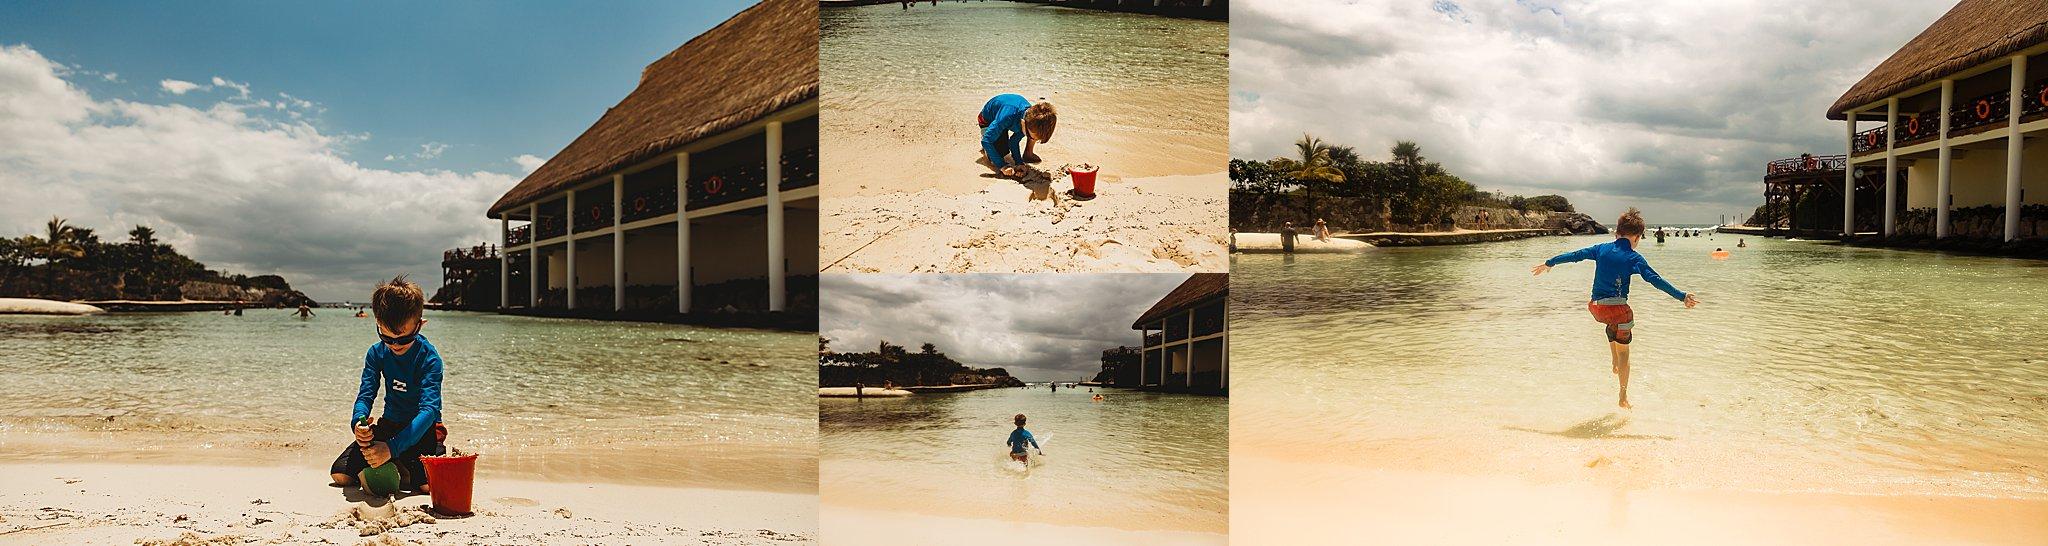 Mexico Vacation 2019 Anna Hurley Photography 38.jpg